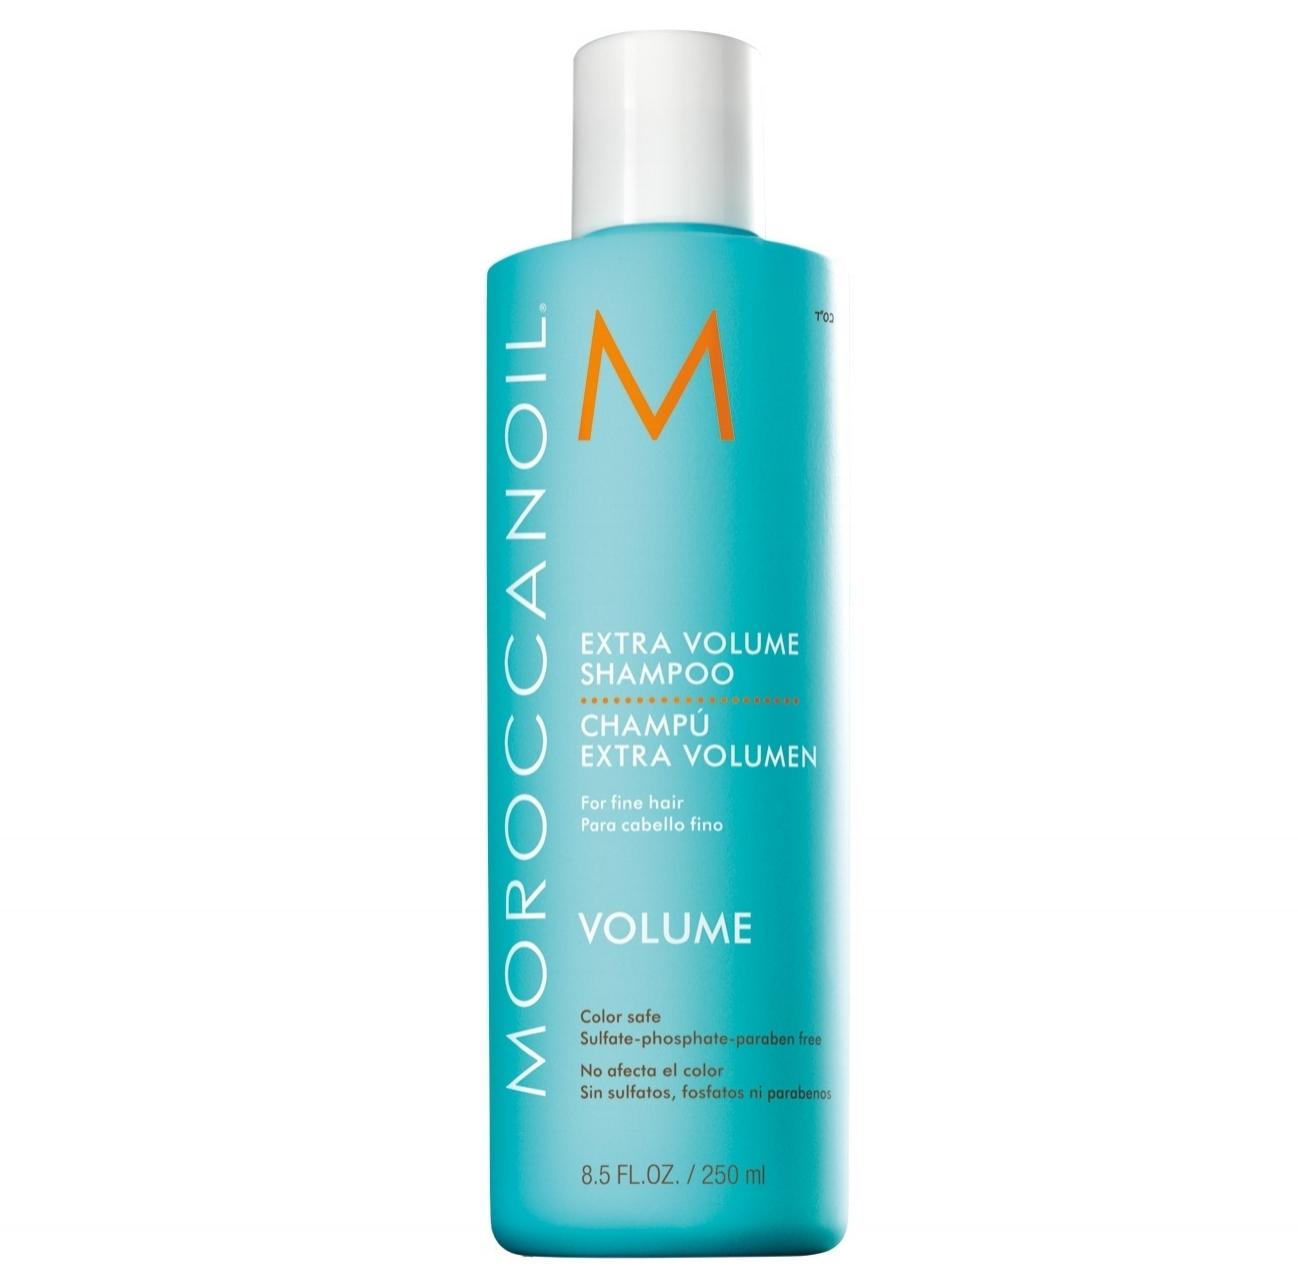 extra-volume-shampoo-48362.jpg